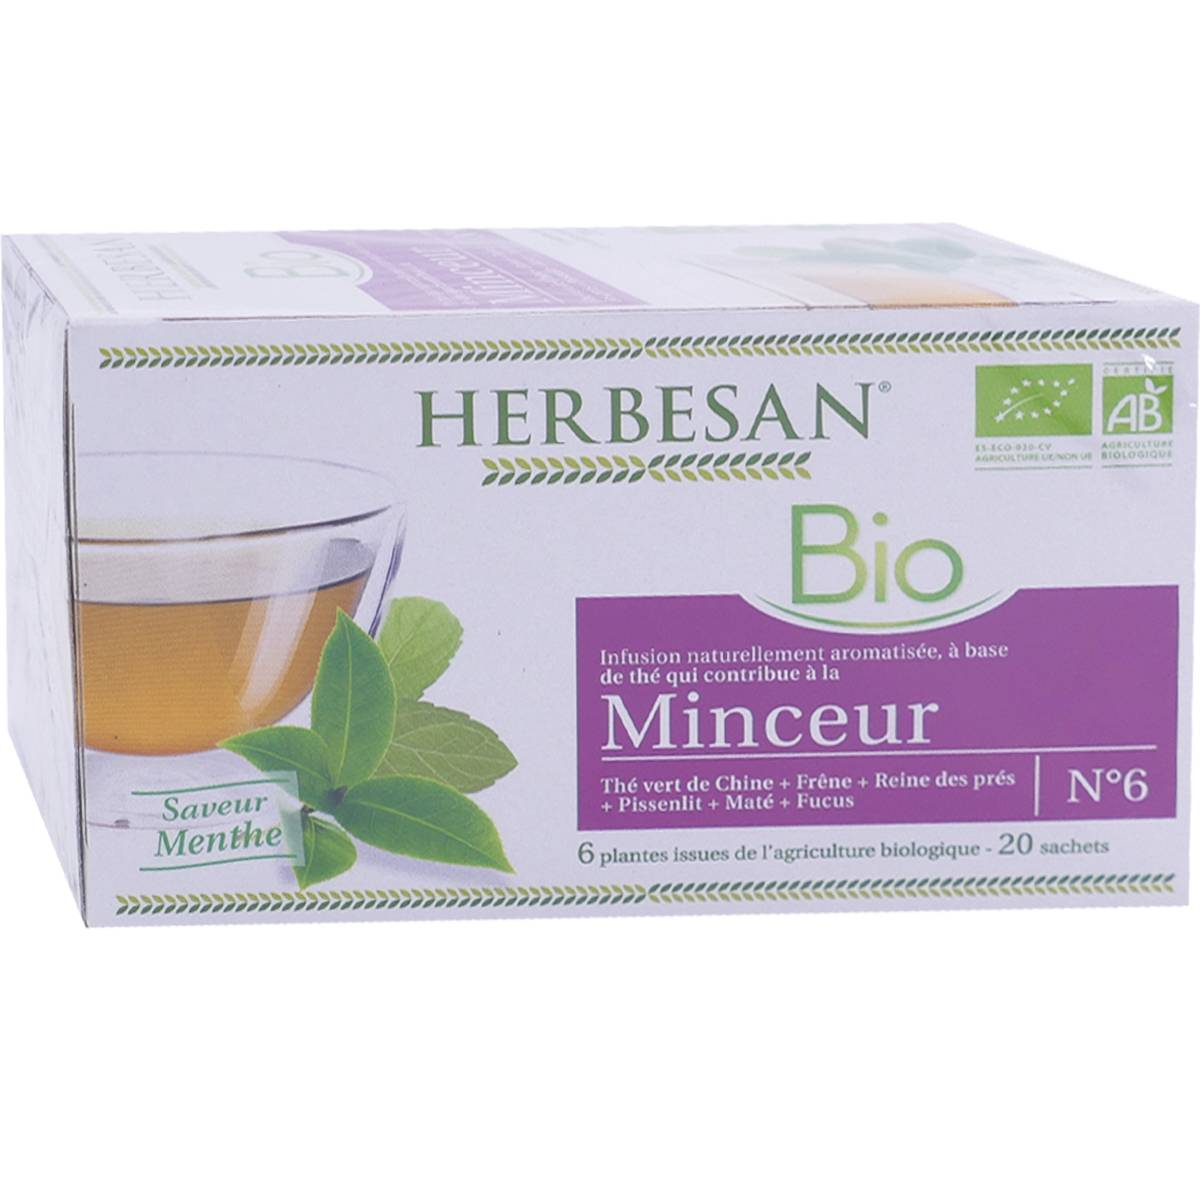 Herbesan bio minceur saveur menthe 20 sachets